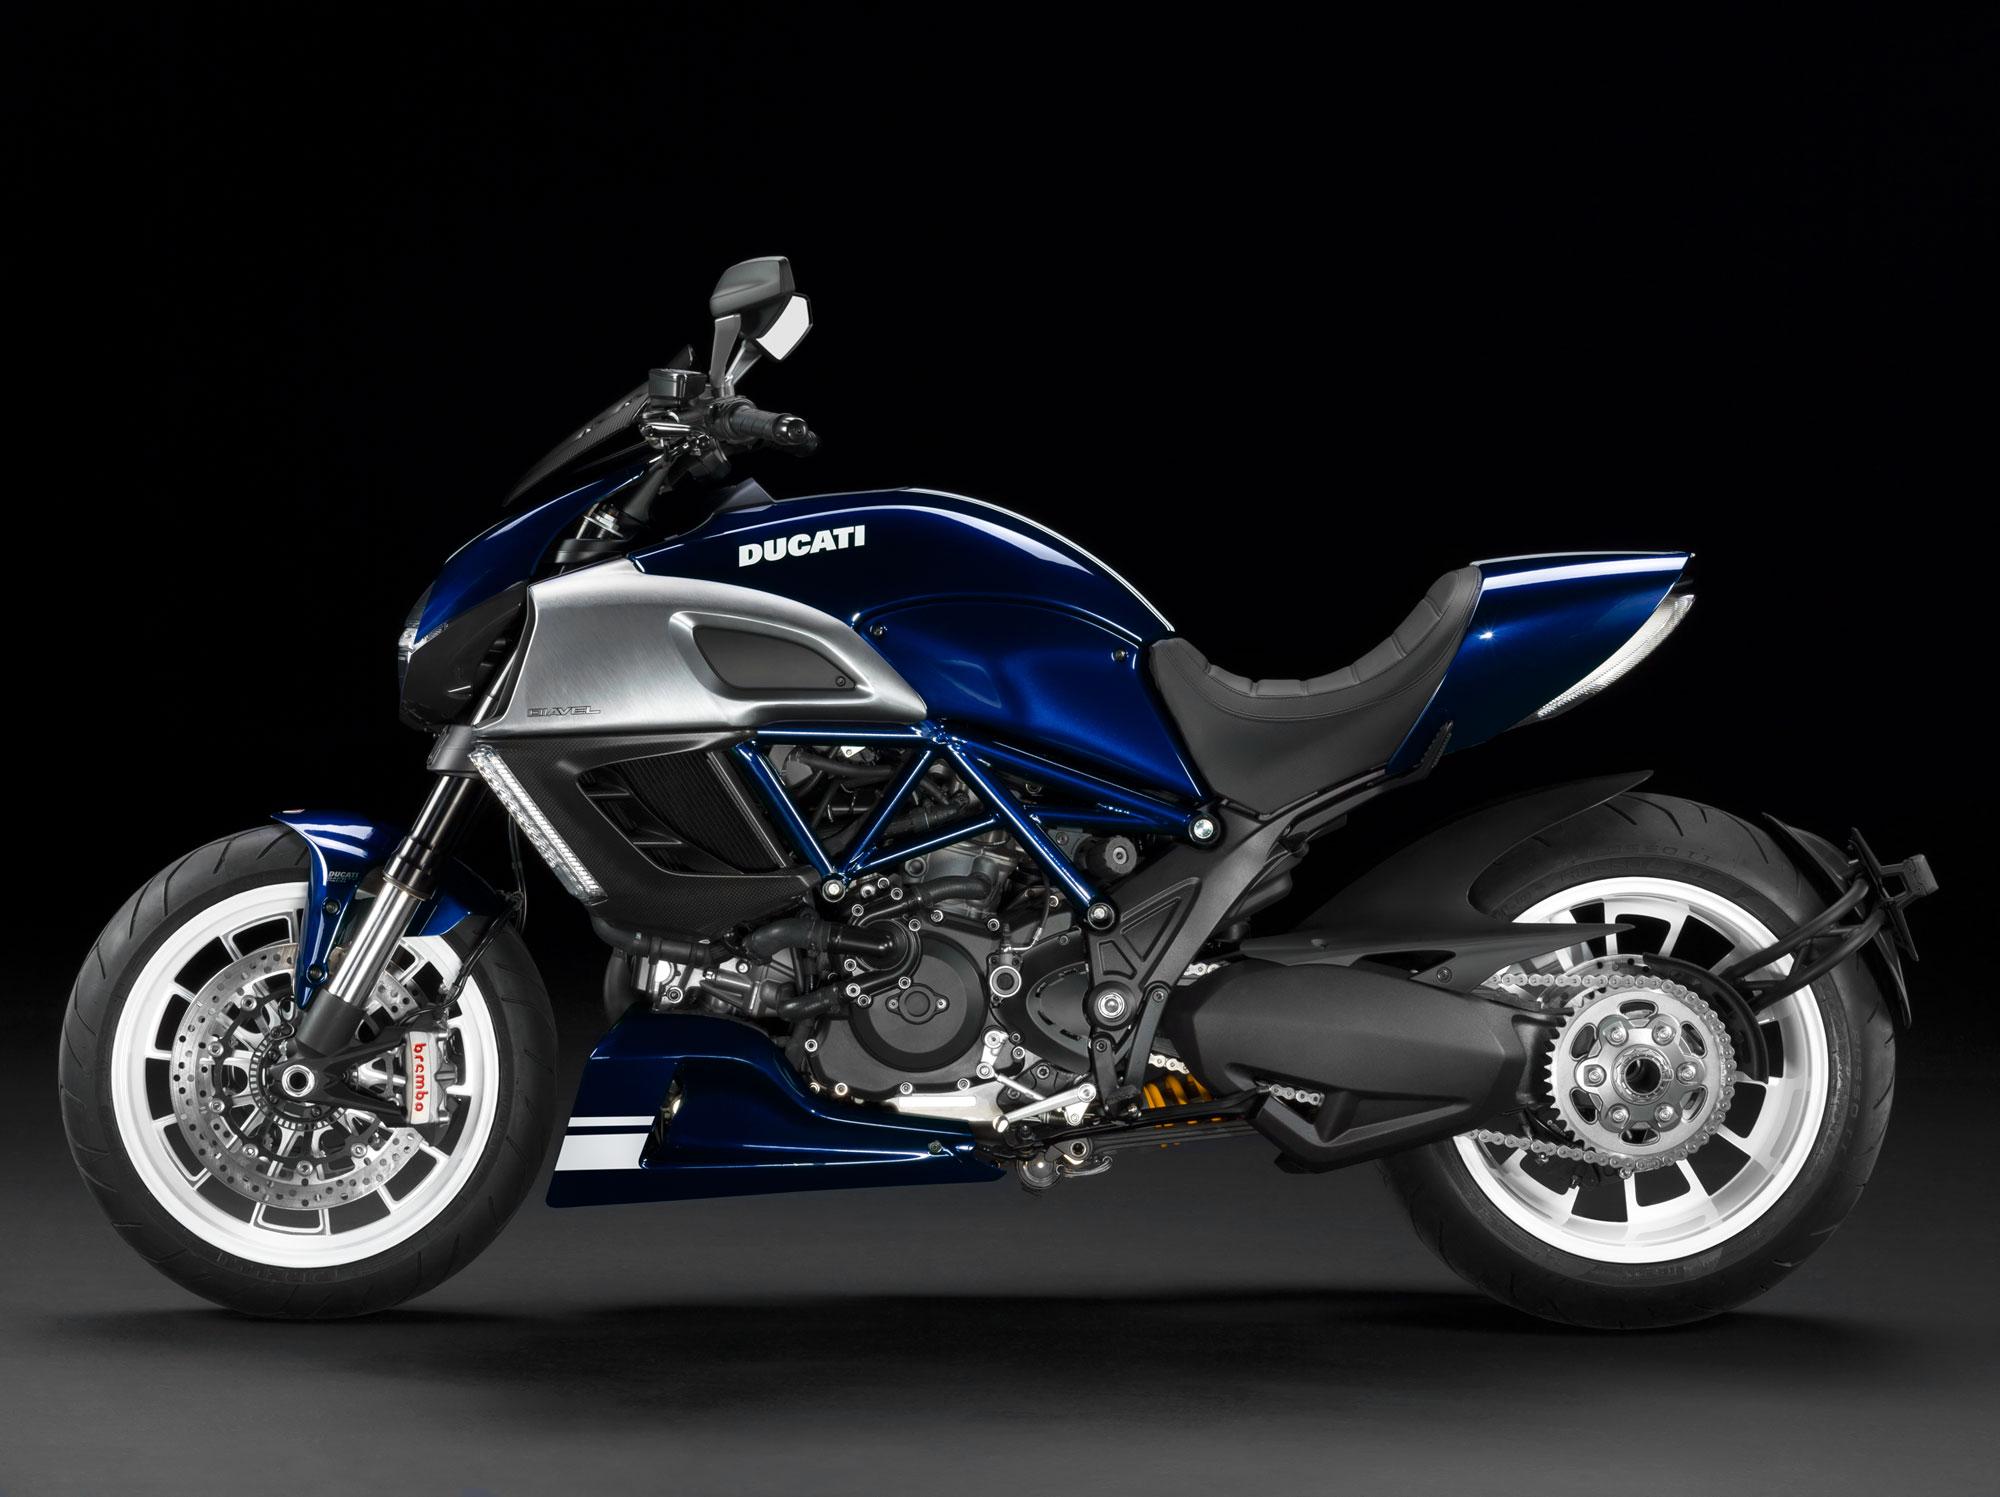 2013 Ducati Diavel q wallpaper 2000x1497 86956 WallpaperUP 2000x1497